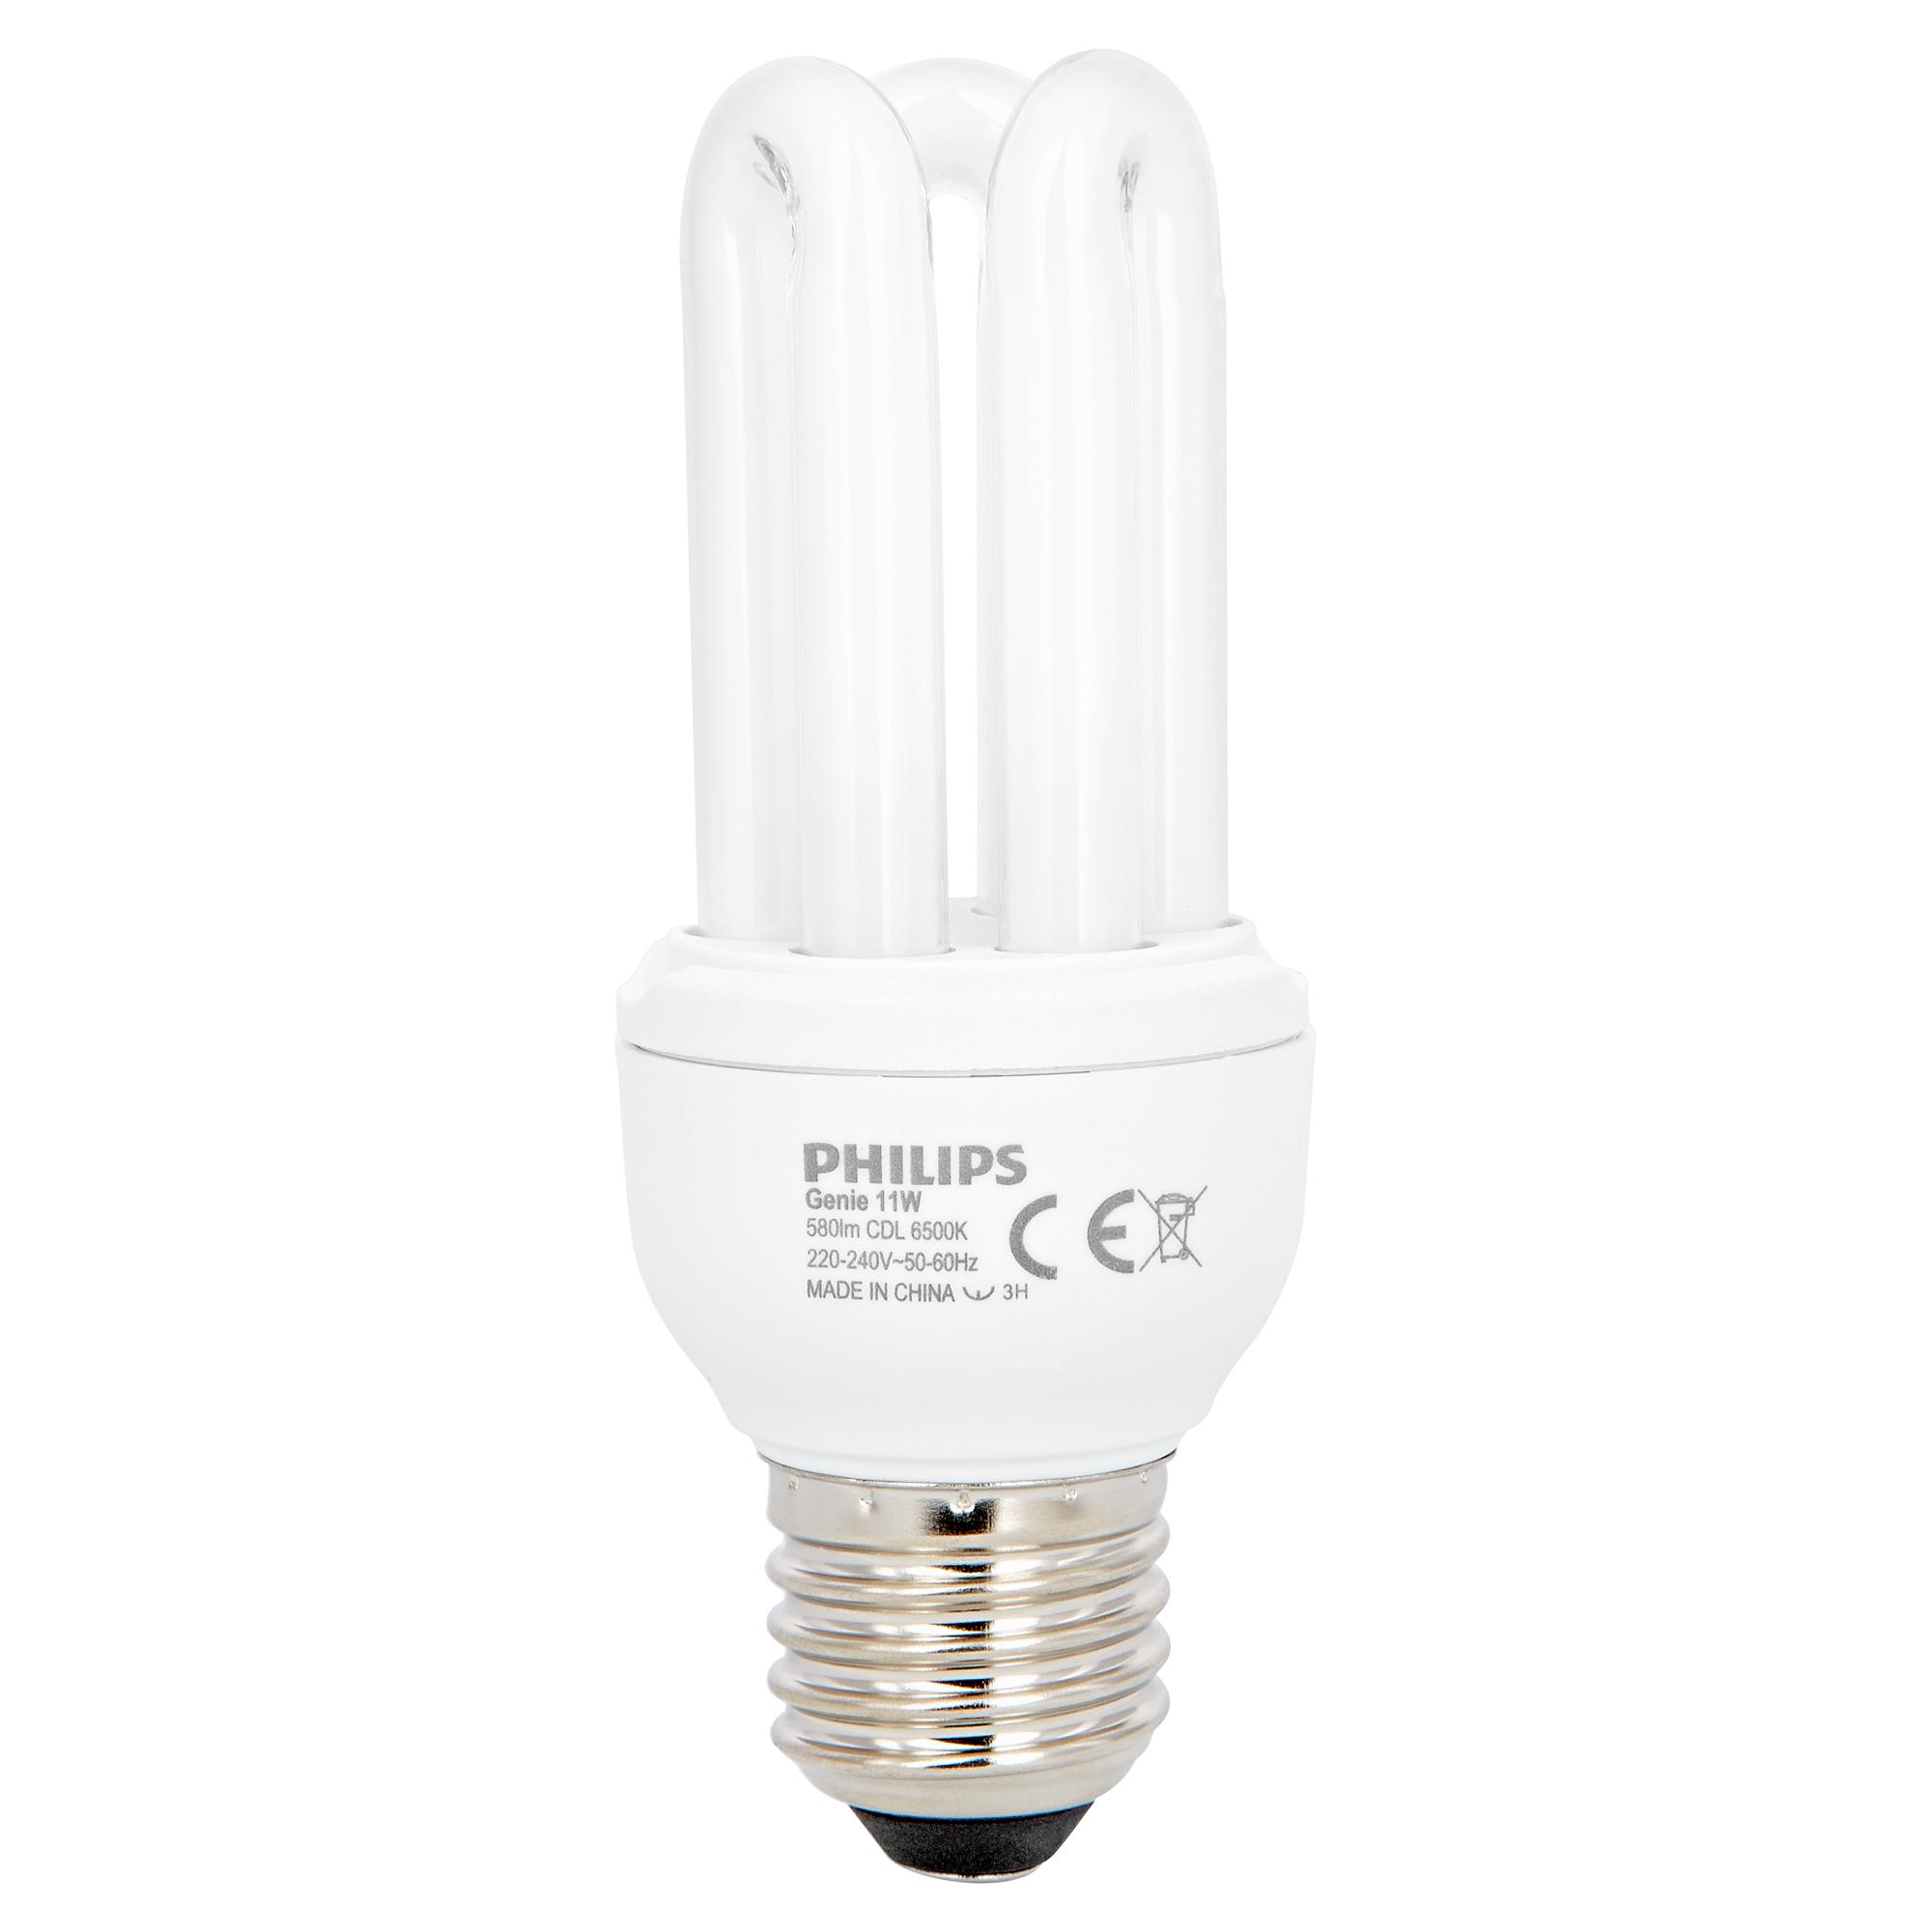 Philips Energiesparlampe 'Genie' E27 11 W tageslichtweiß   Lampen > Leuchtmittel > Energiesparlampen   Philips